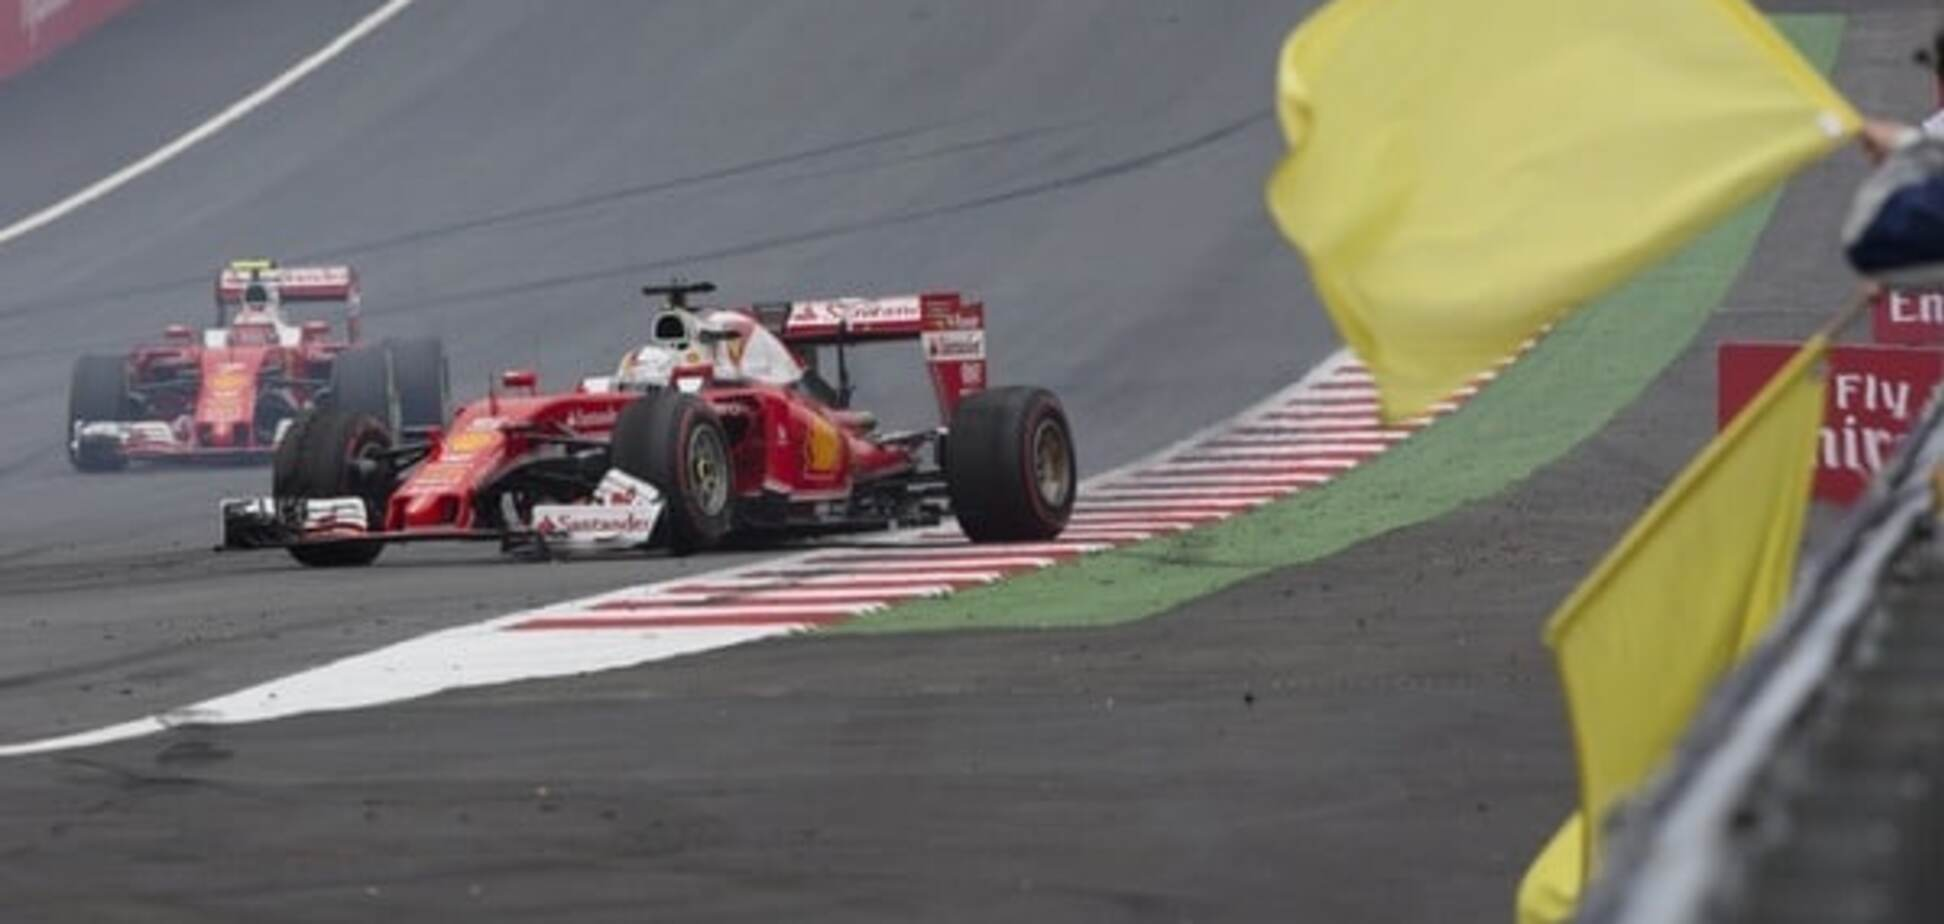 Шок для Ferrari. На Гран-при Австрии Феттель попал в аварию на скорости 300 км/ч: видео крушения